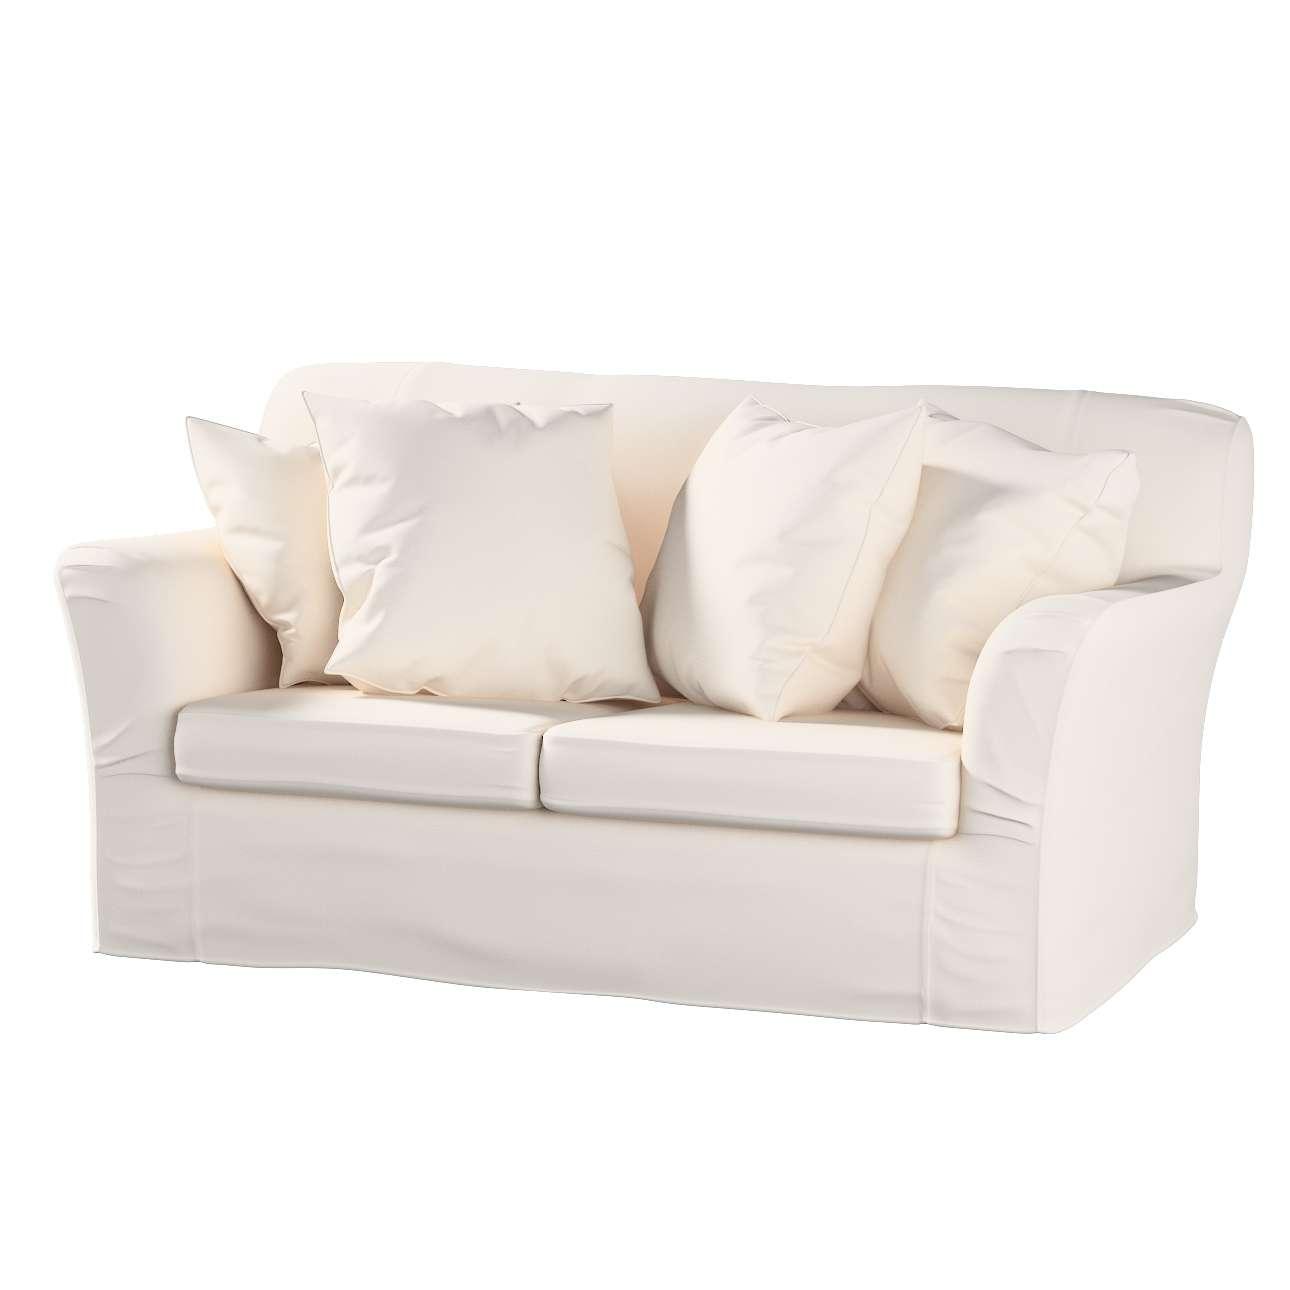 TOMELILLA  dvivietės sofos užvalkalas TOMELILLA dvivietė sofa kolekcijoje Etna , audinys: 705-01